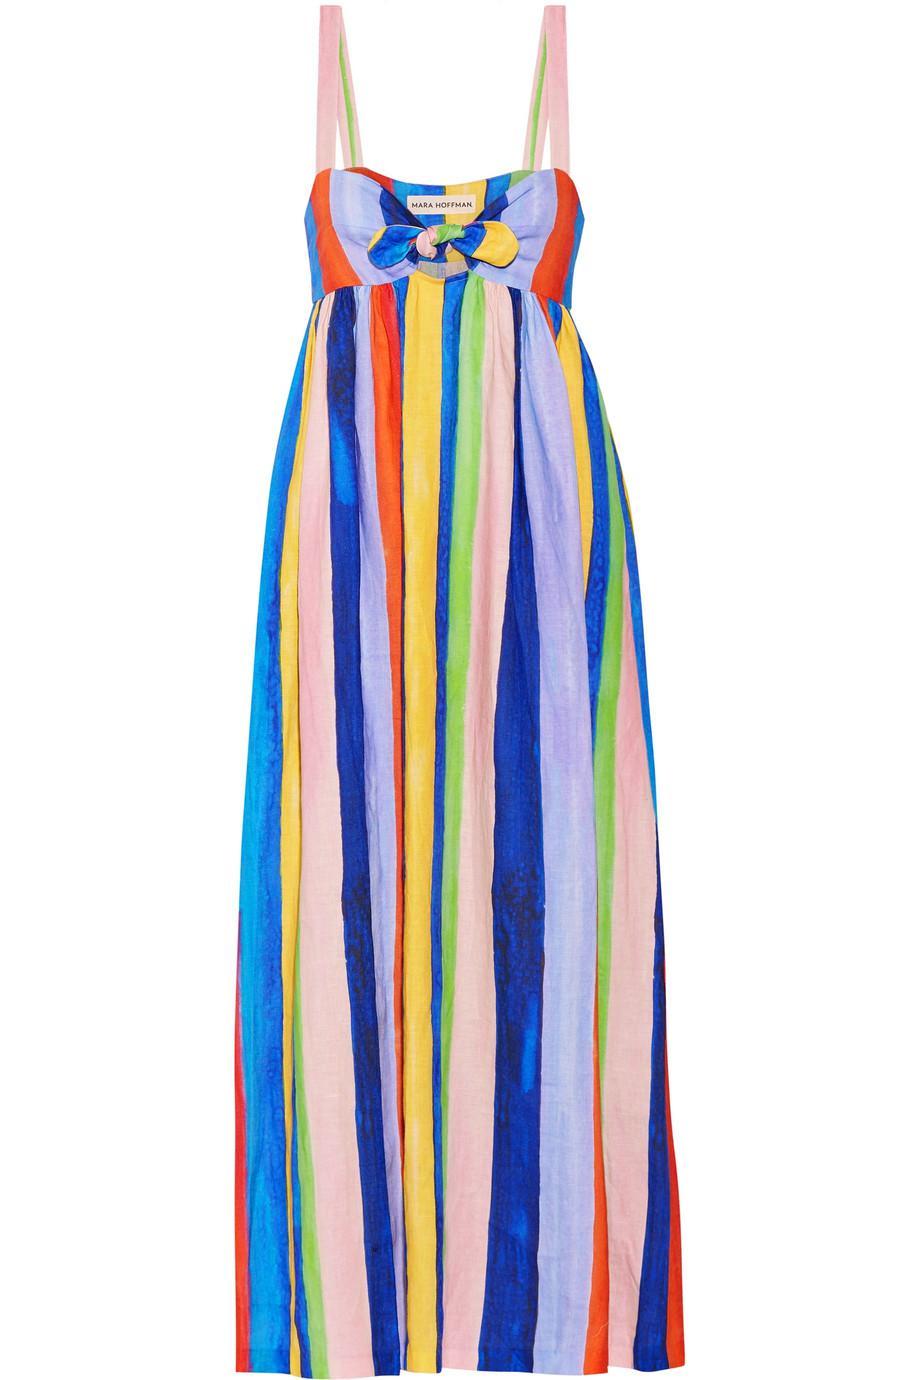 ed2c0402d Lyst - Mara Hoffman Tie-front Striped Organic Linen Maxi Dress in Blue